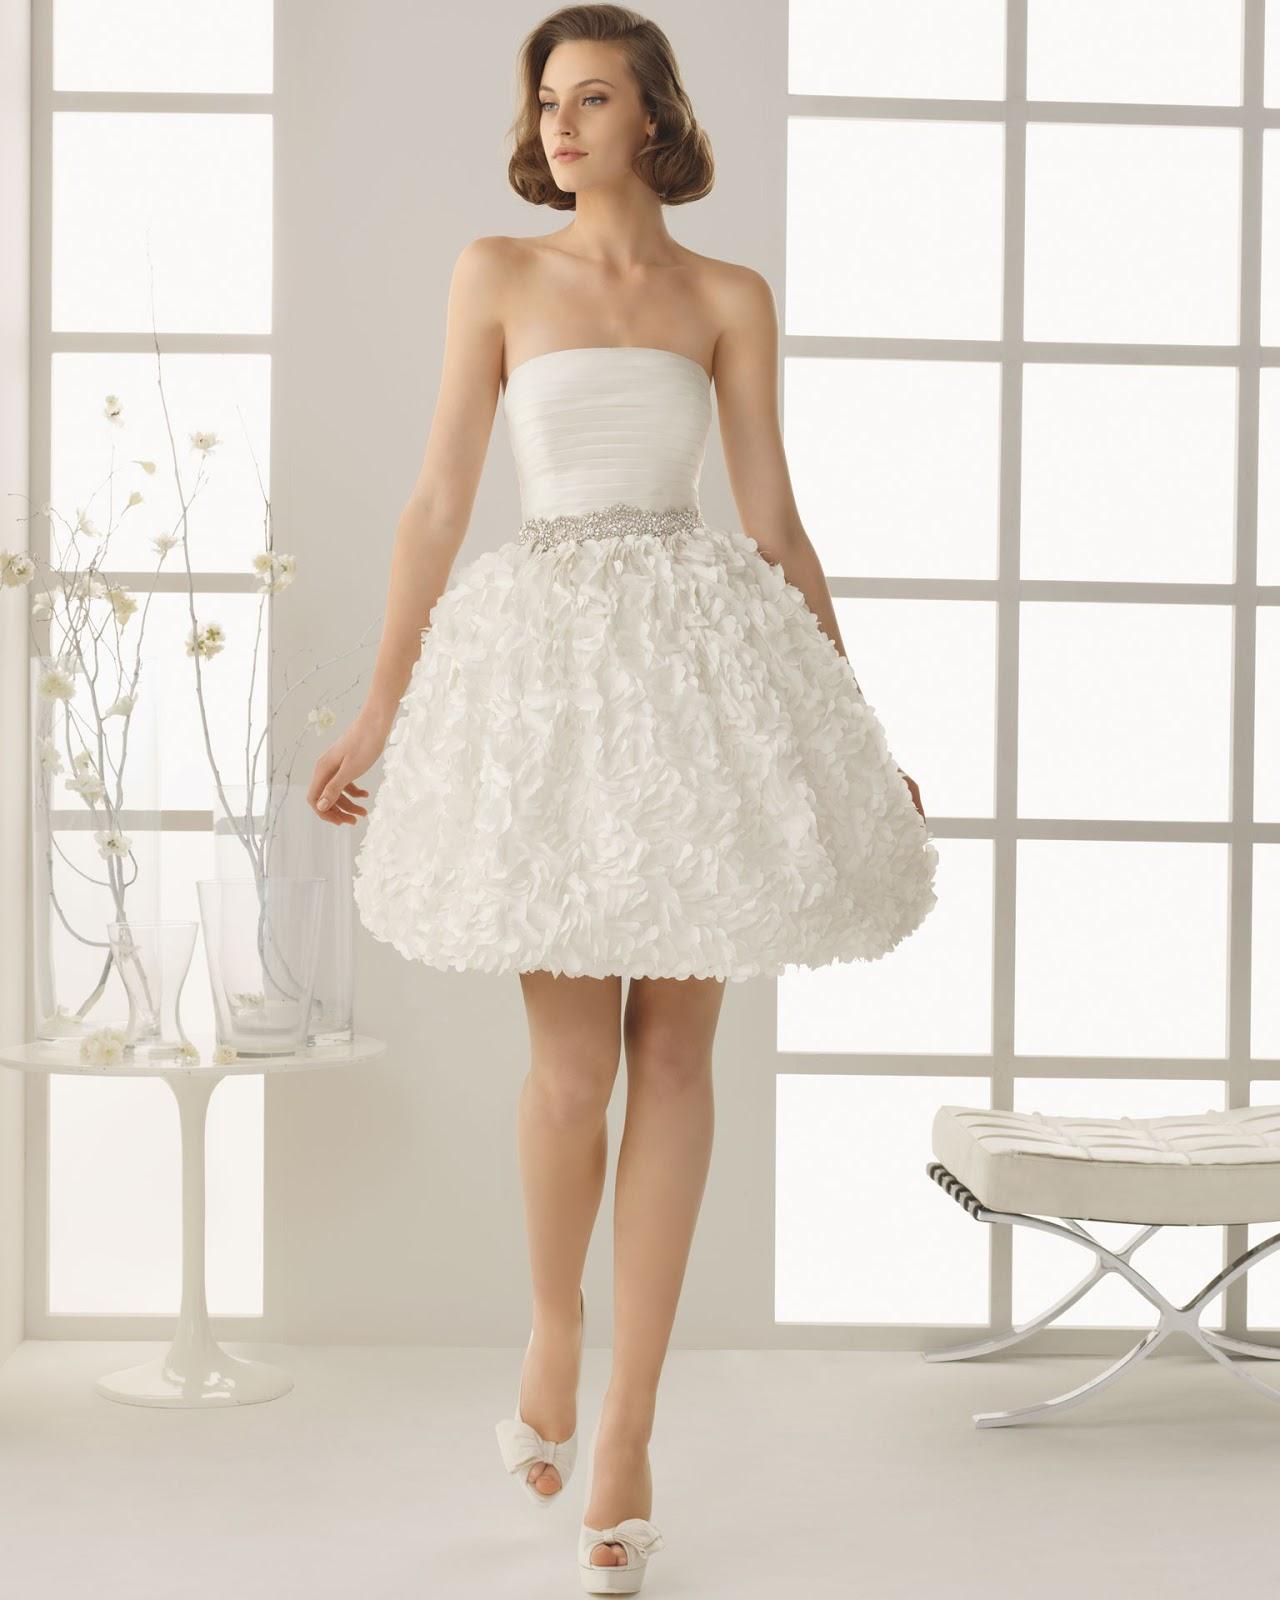 d79c9f882e03 White Short Wedding Dresses Vera Wang | wedding dresses cold climates